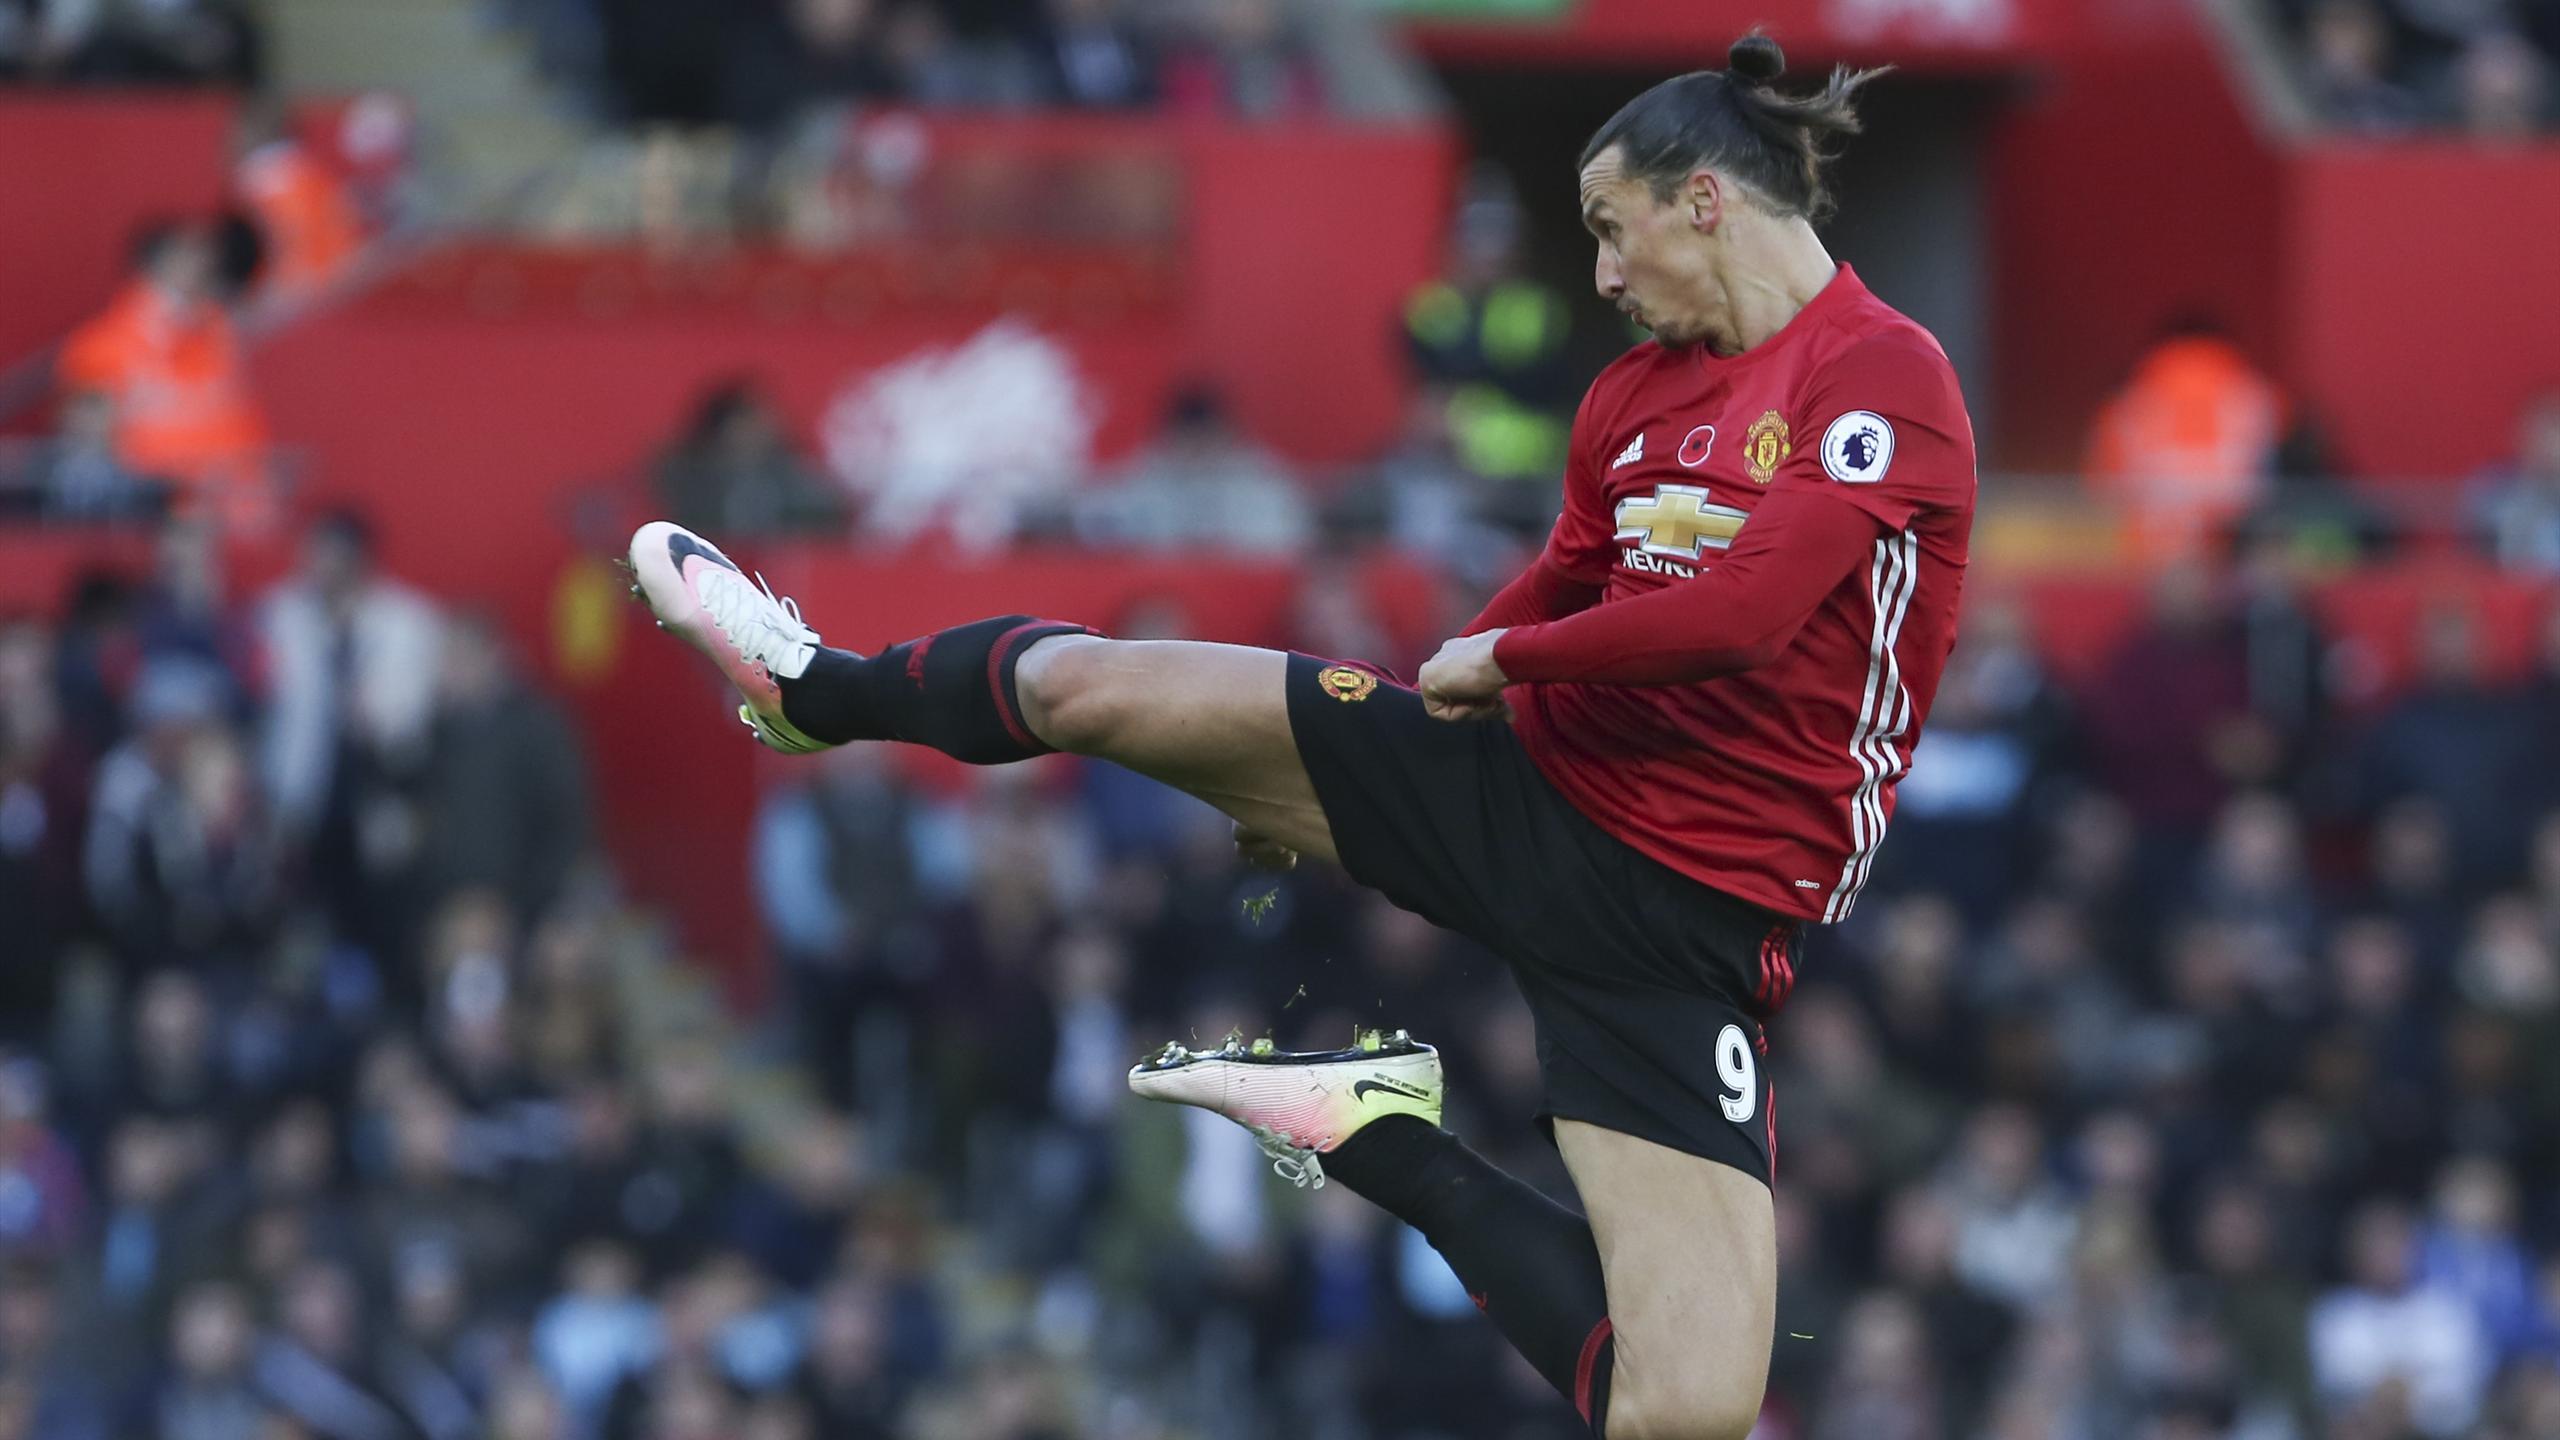 Zlatan Ibrahimovic - Manchester United - Premier League 2016/2017